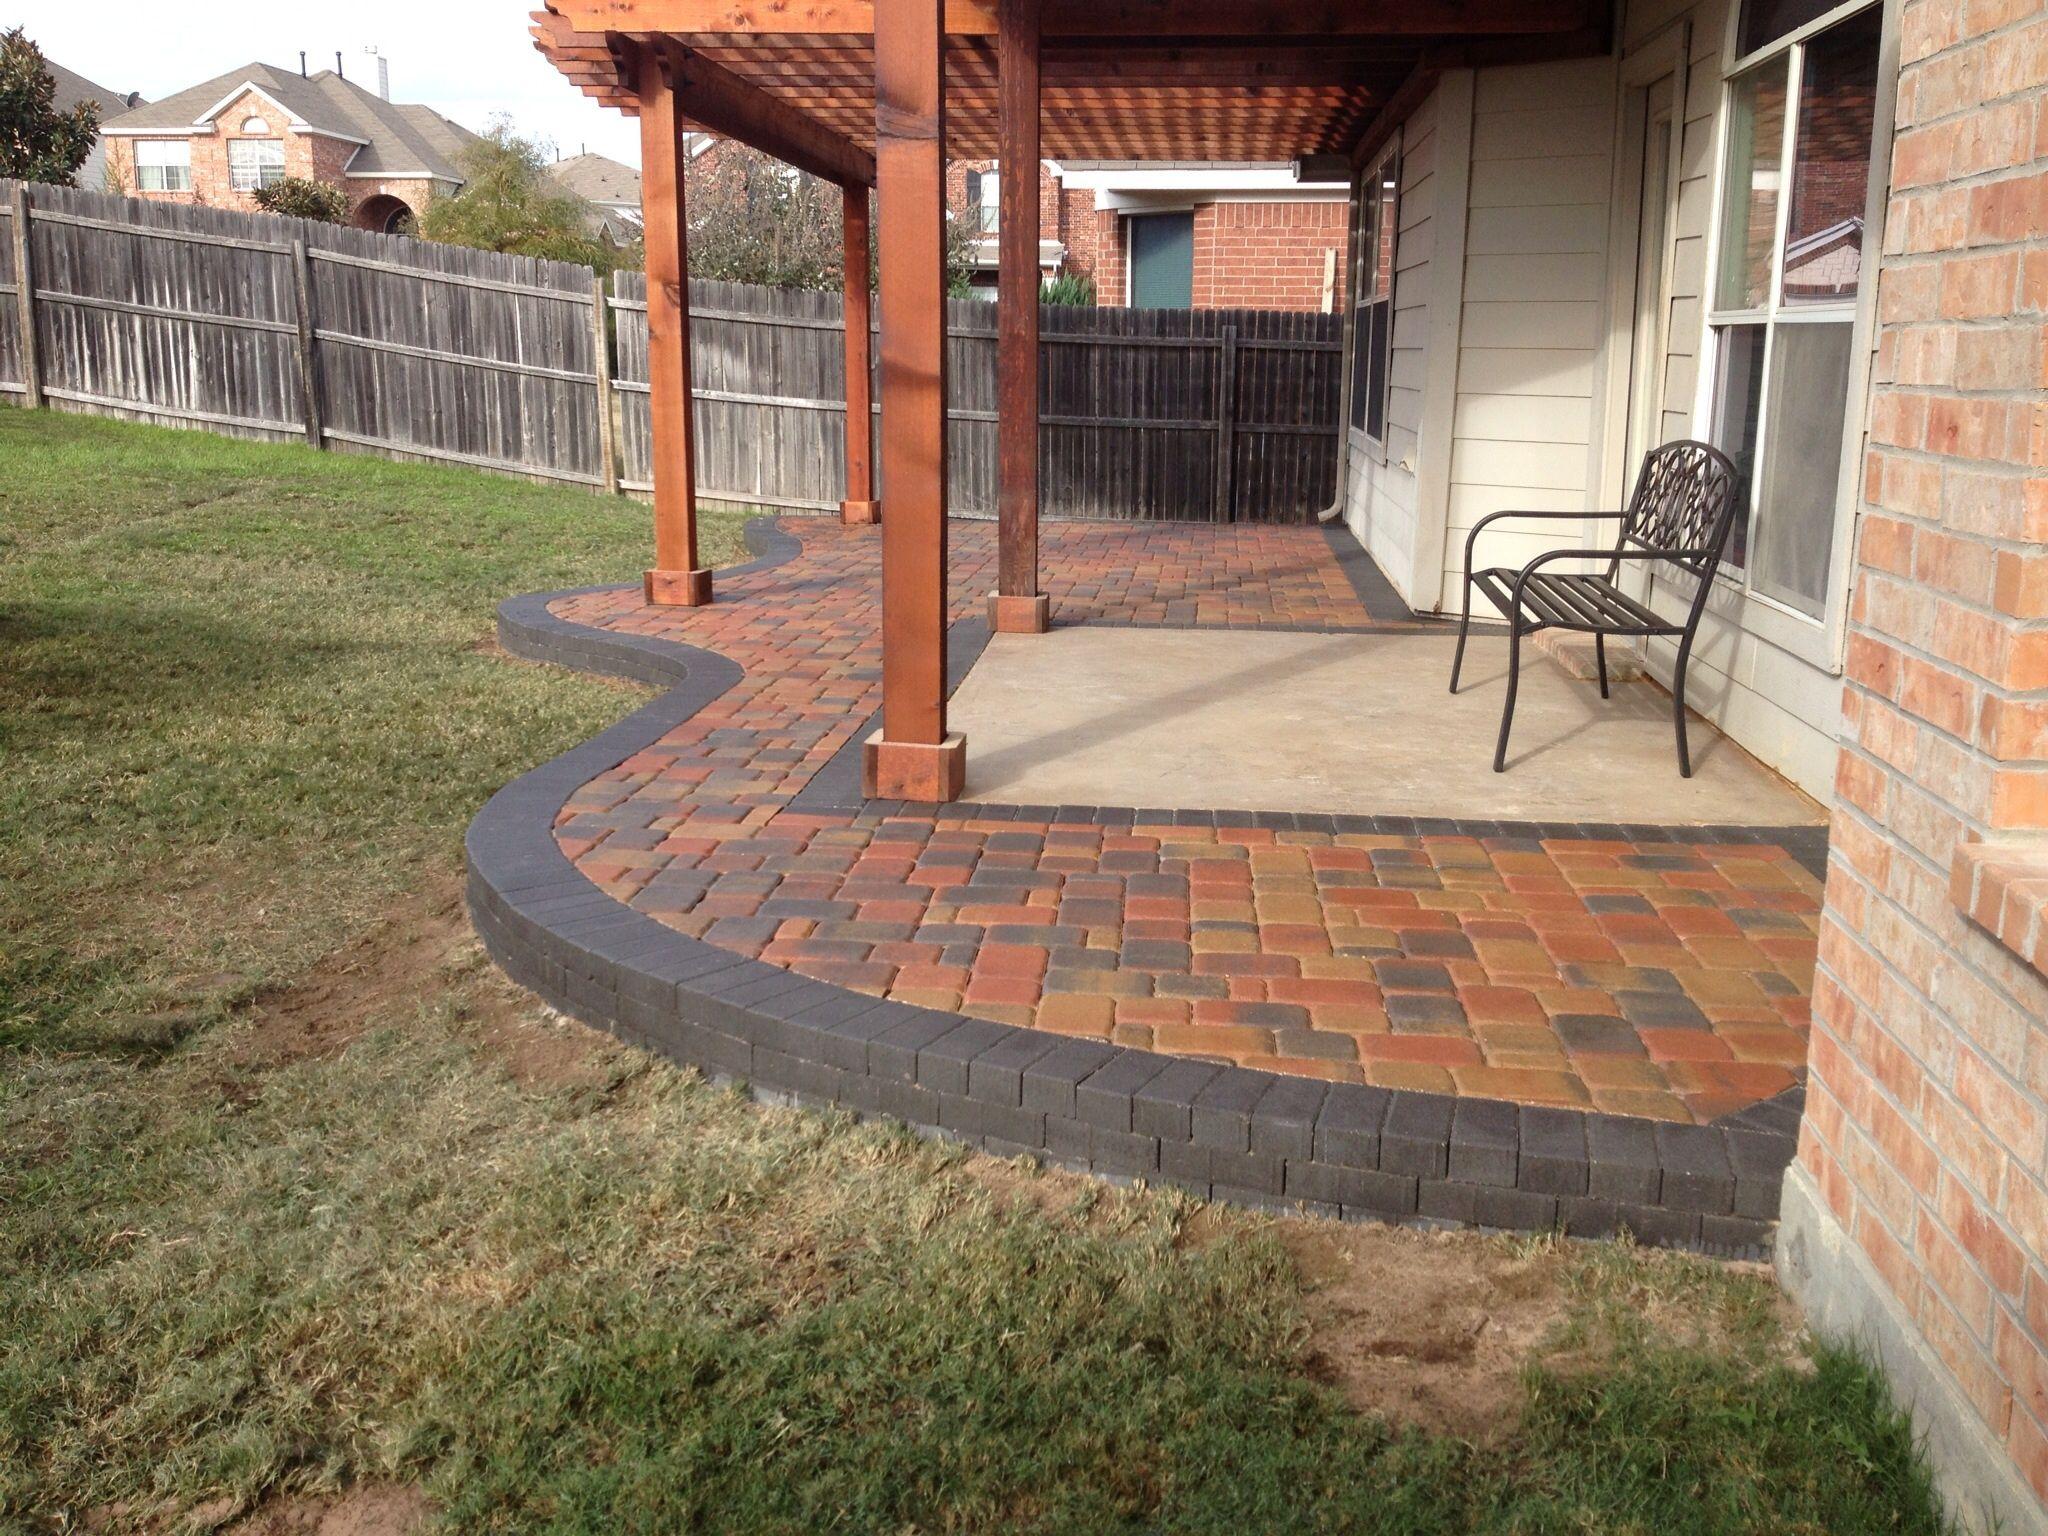 Patio Walls Around Patio Slab : Multicolored paver patio installed around an existing